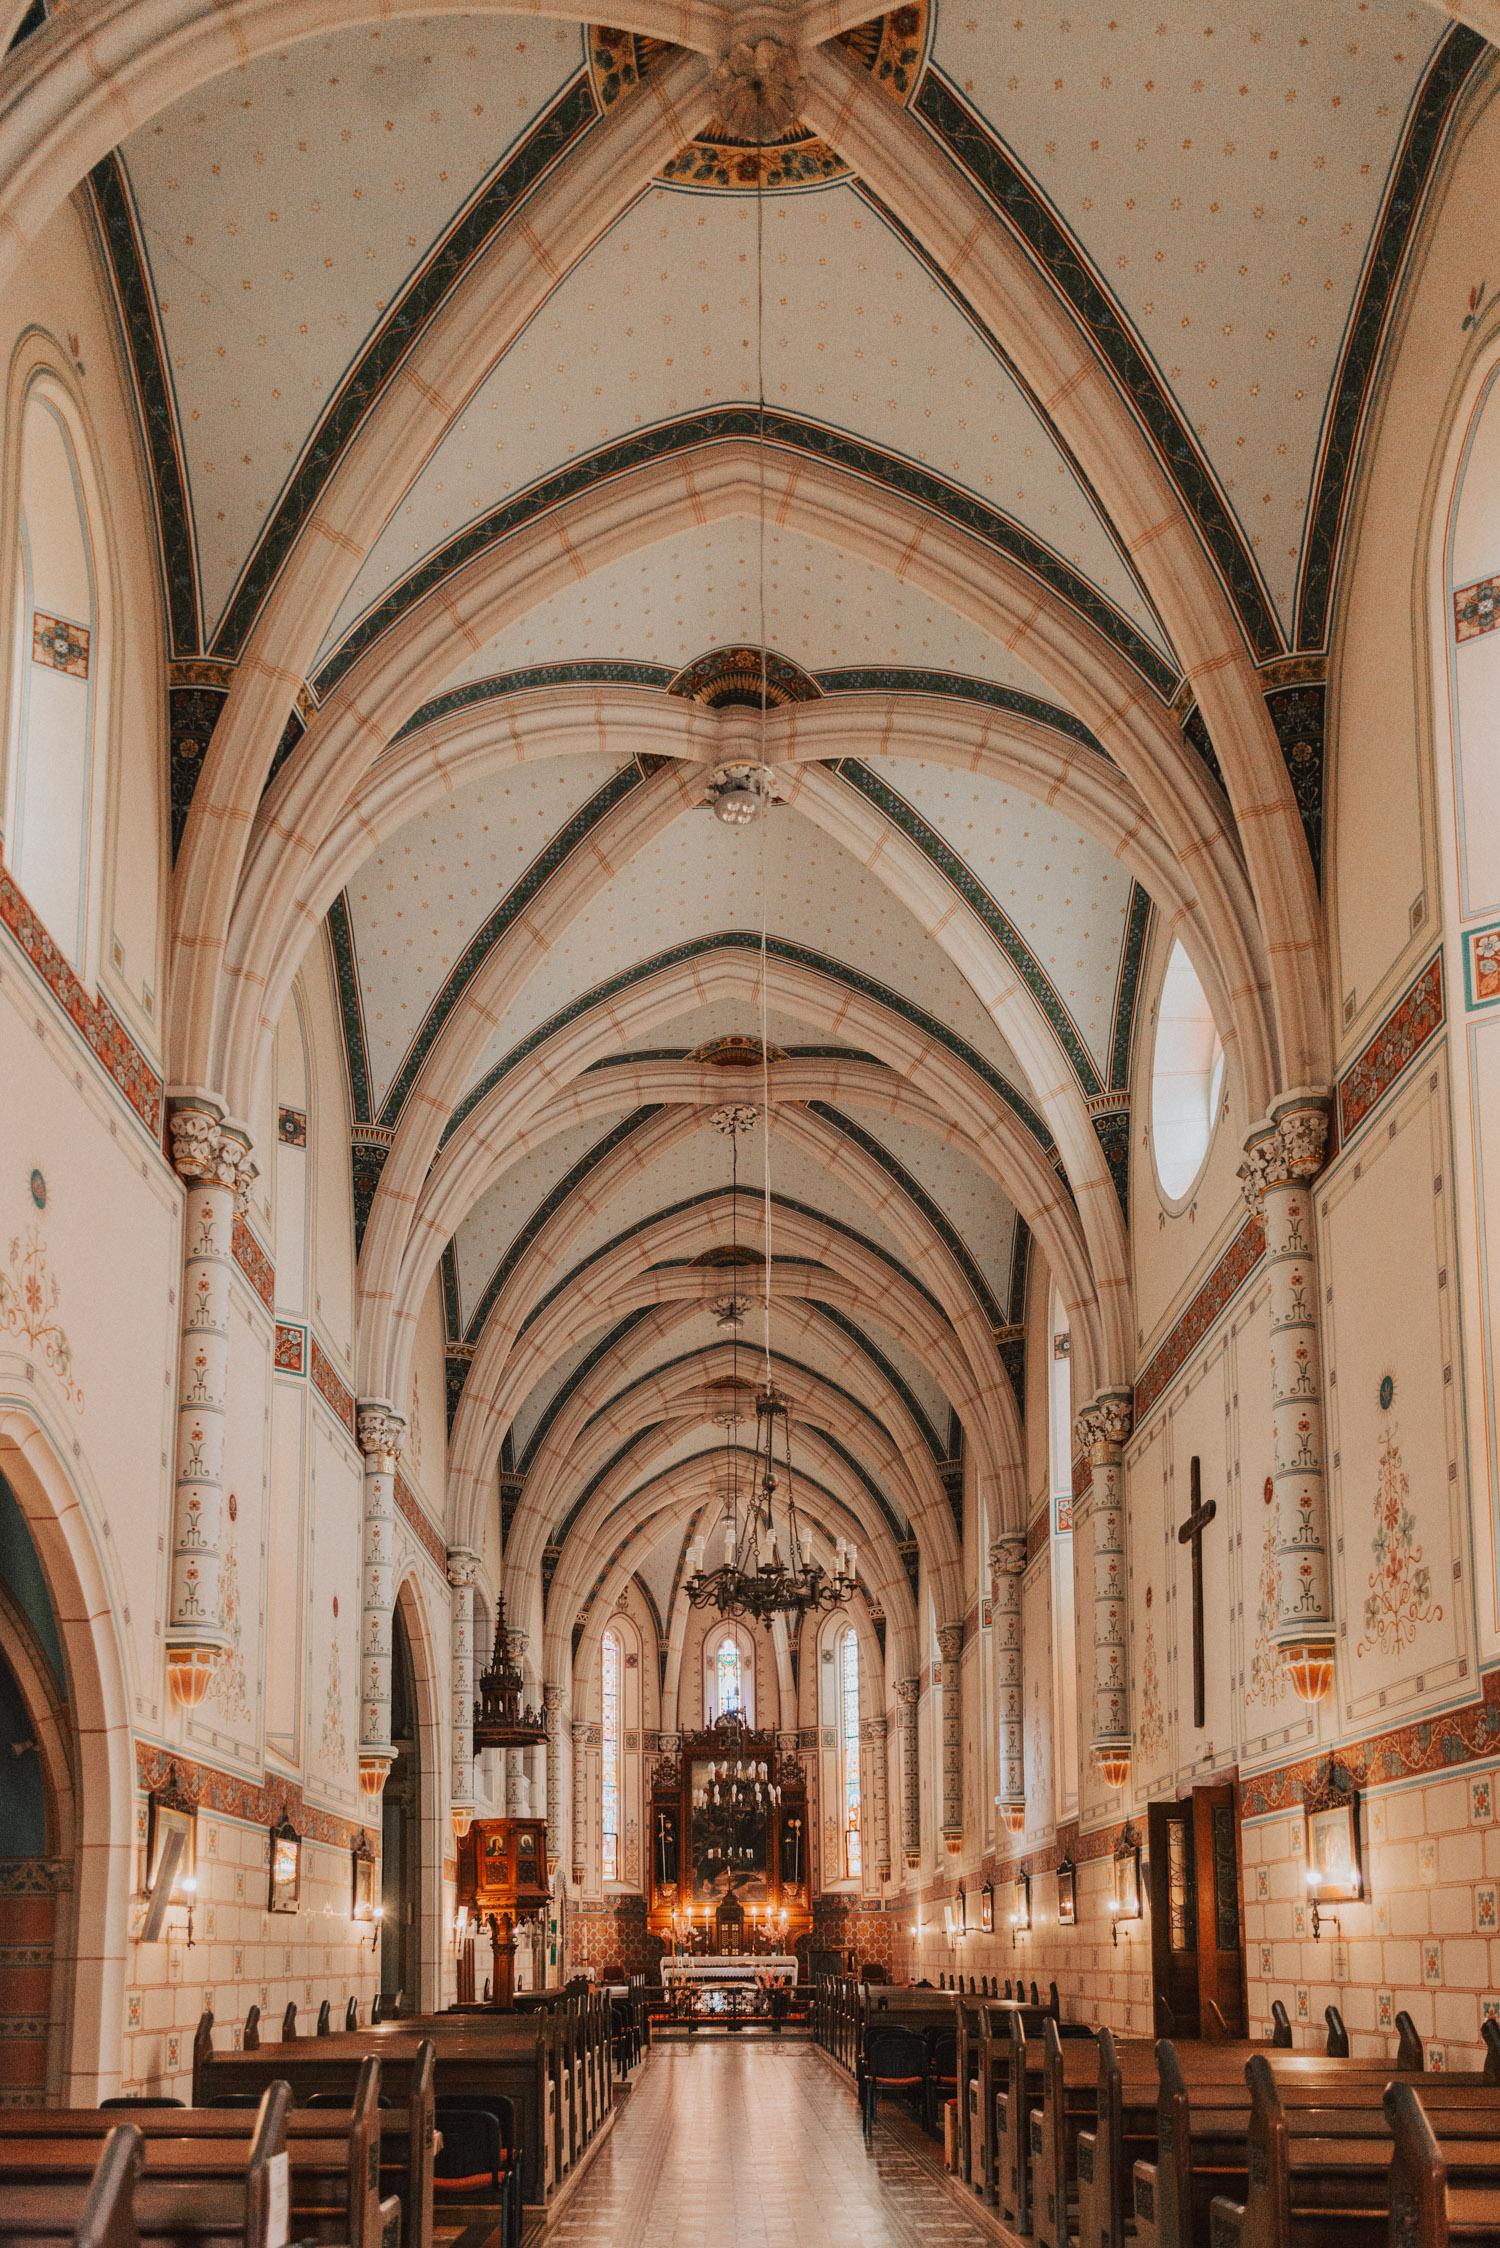 Interior, Church and Monastery of St. John of Capistrano in Ilok, Croatia